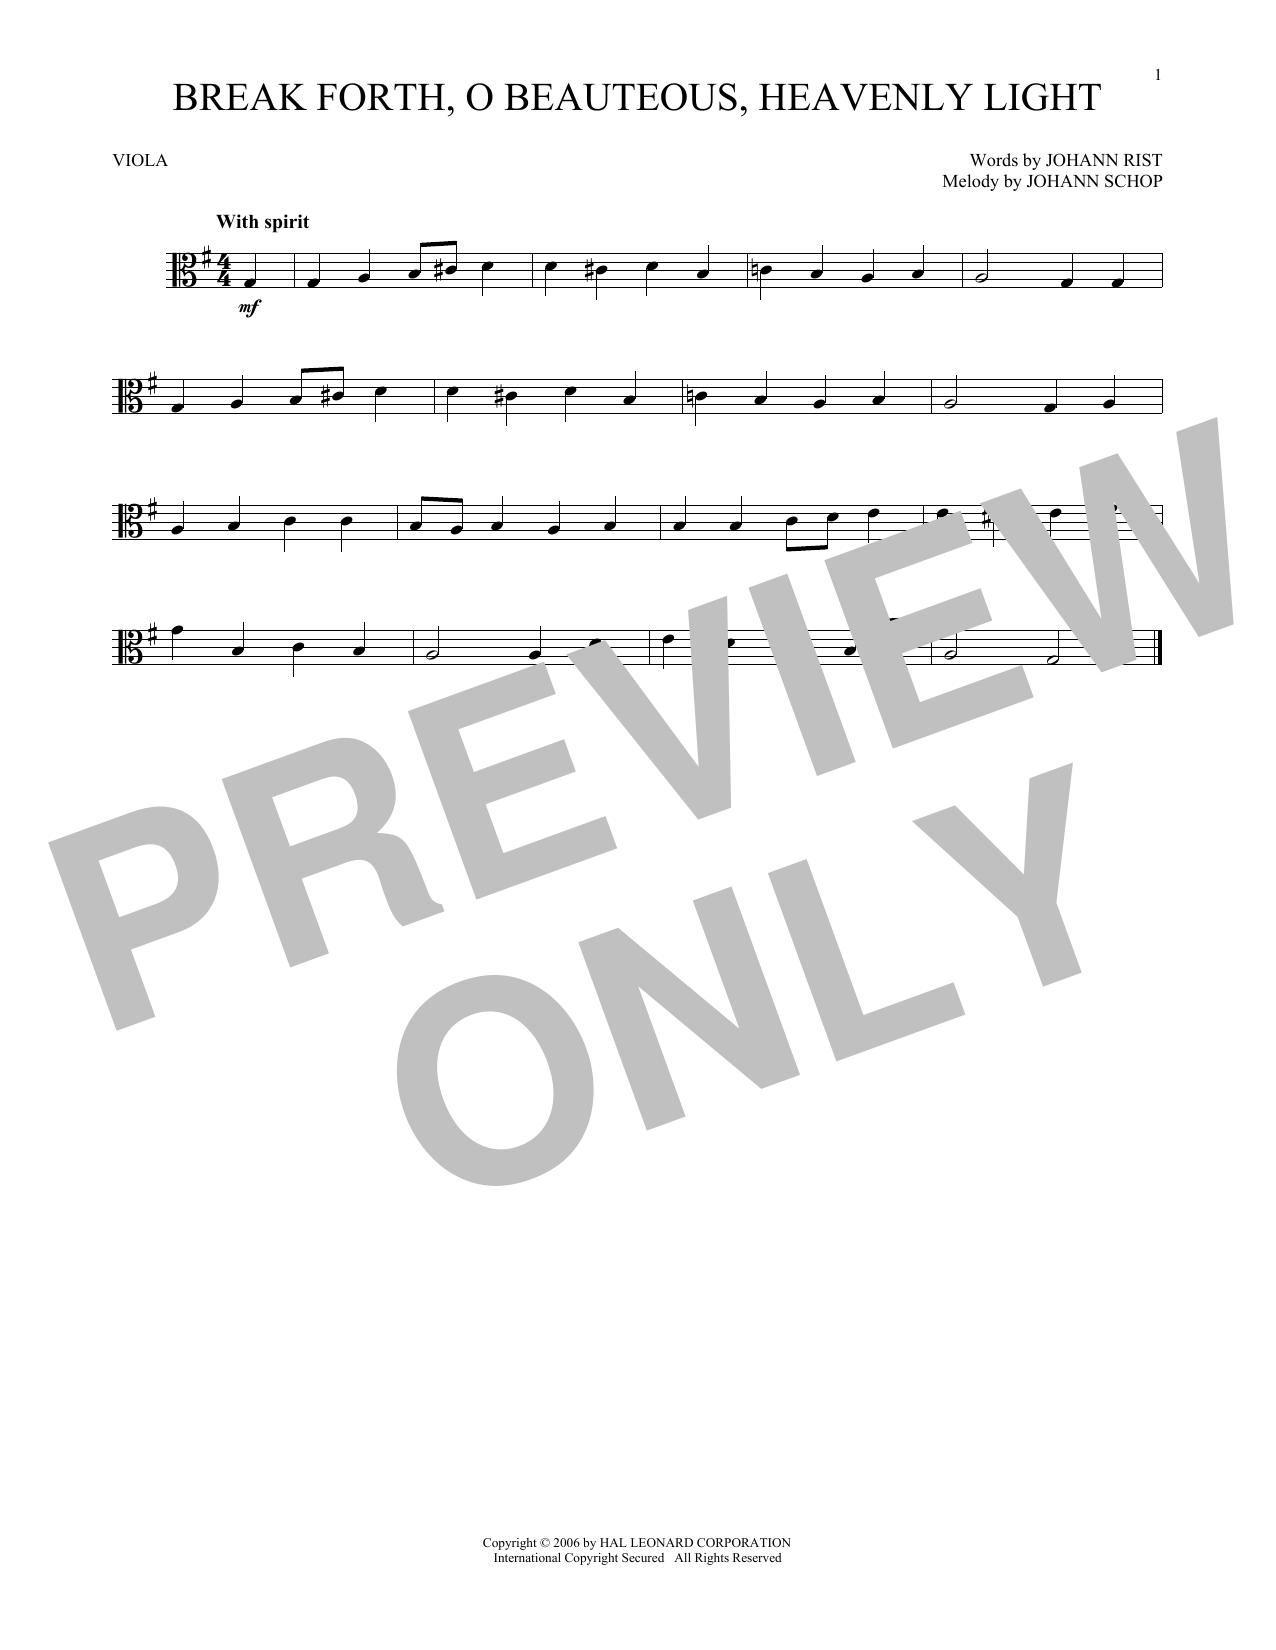 Viola - Christmas Music at Stanton\'s Sheet Music